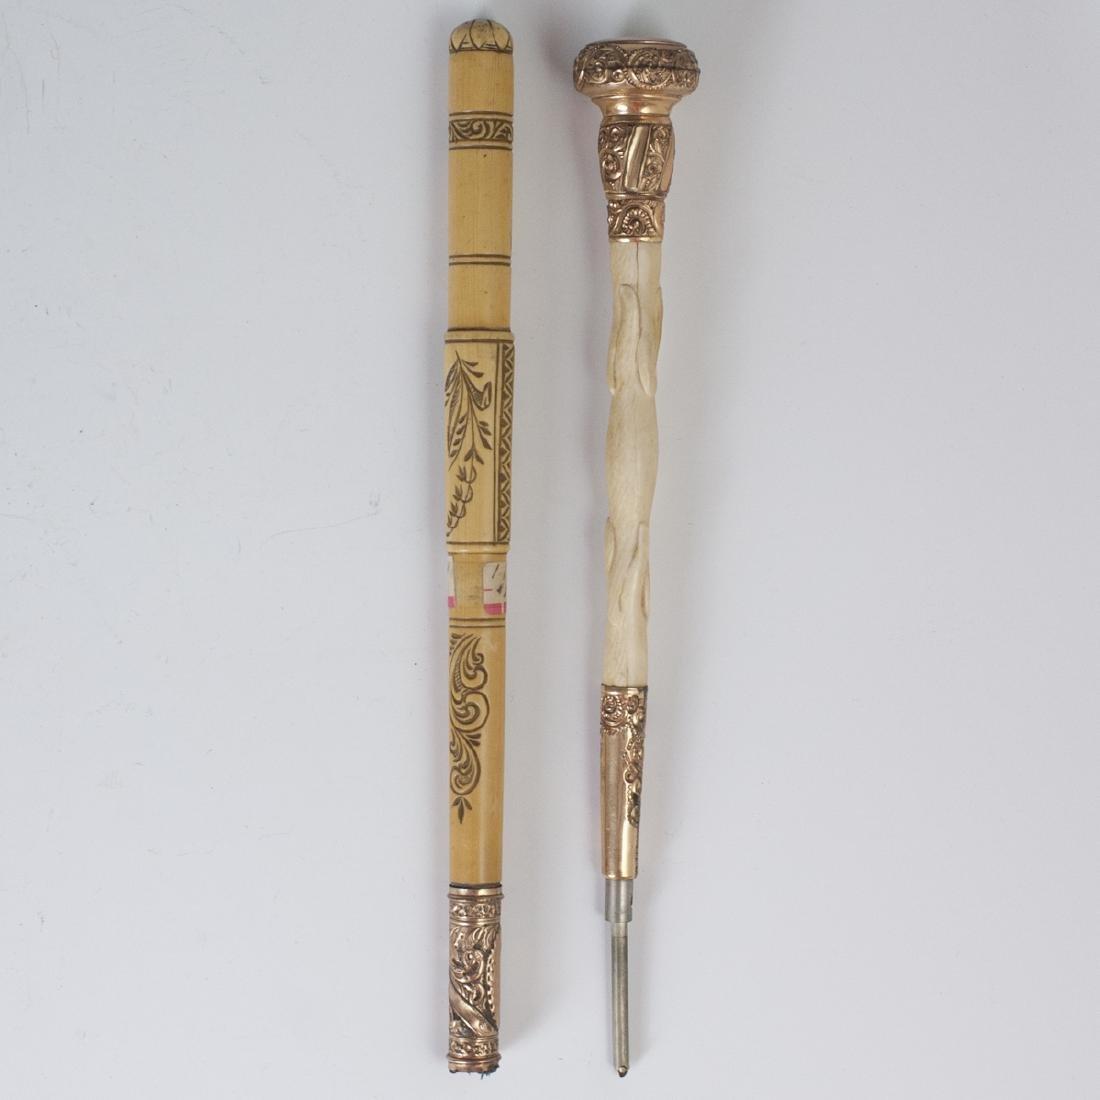 Carved Bone Walking Stick Handles